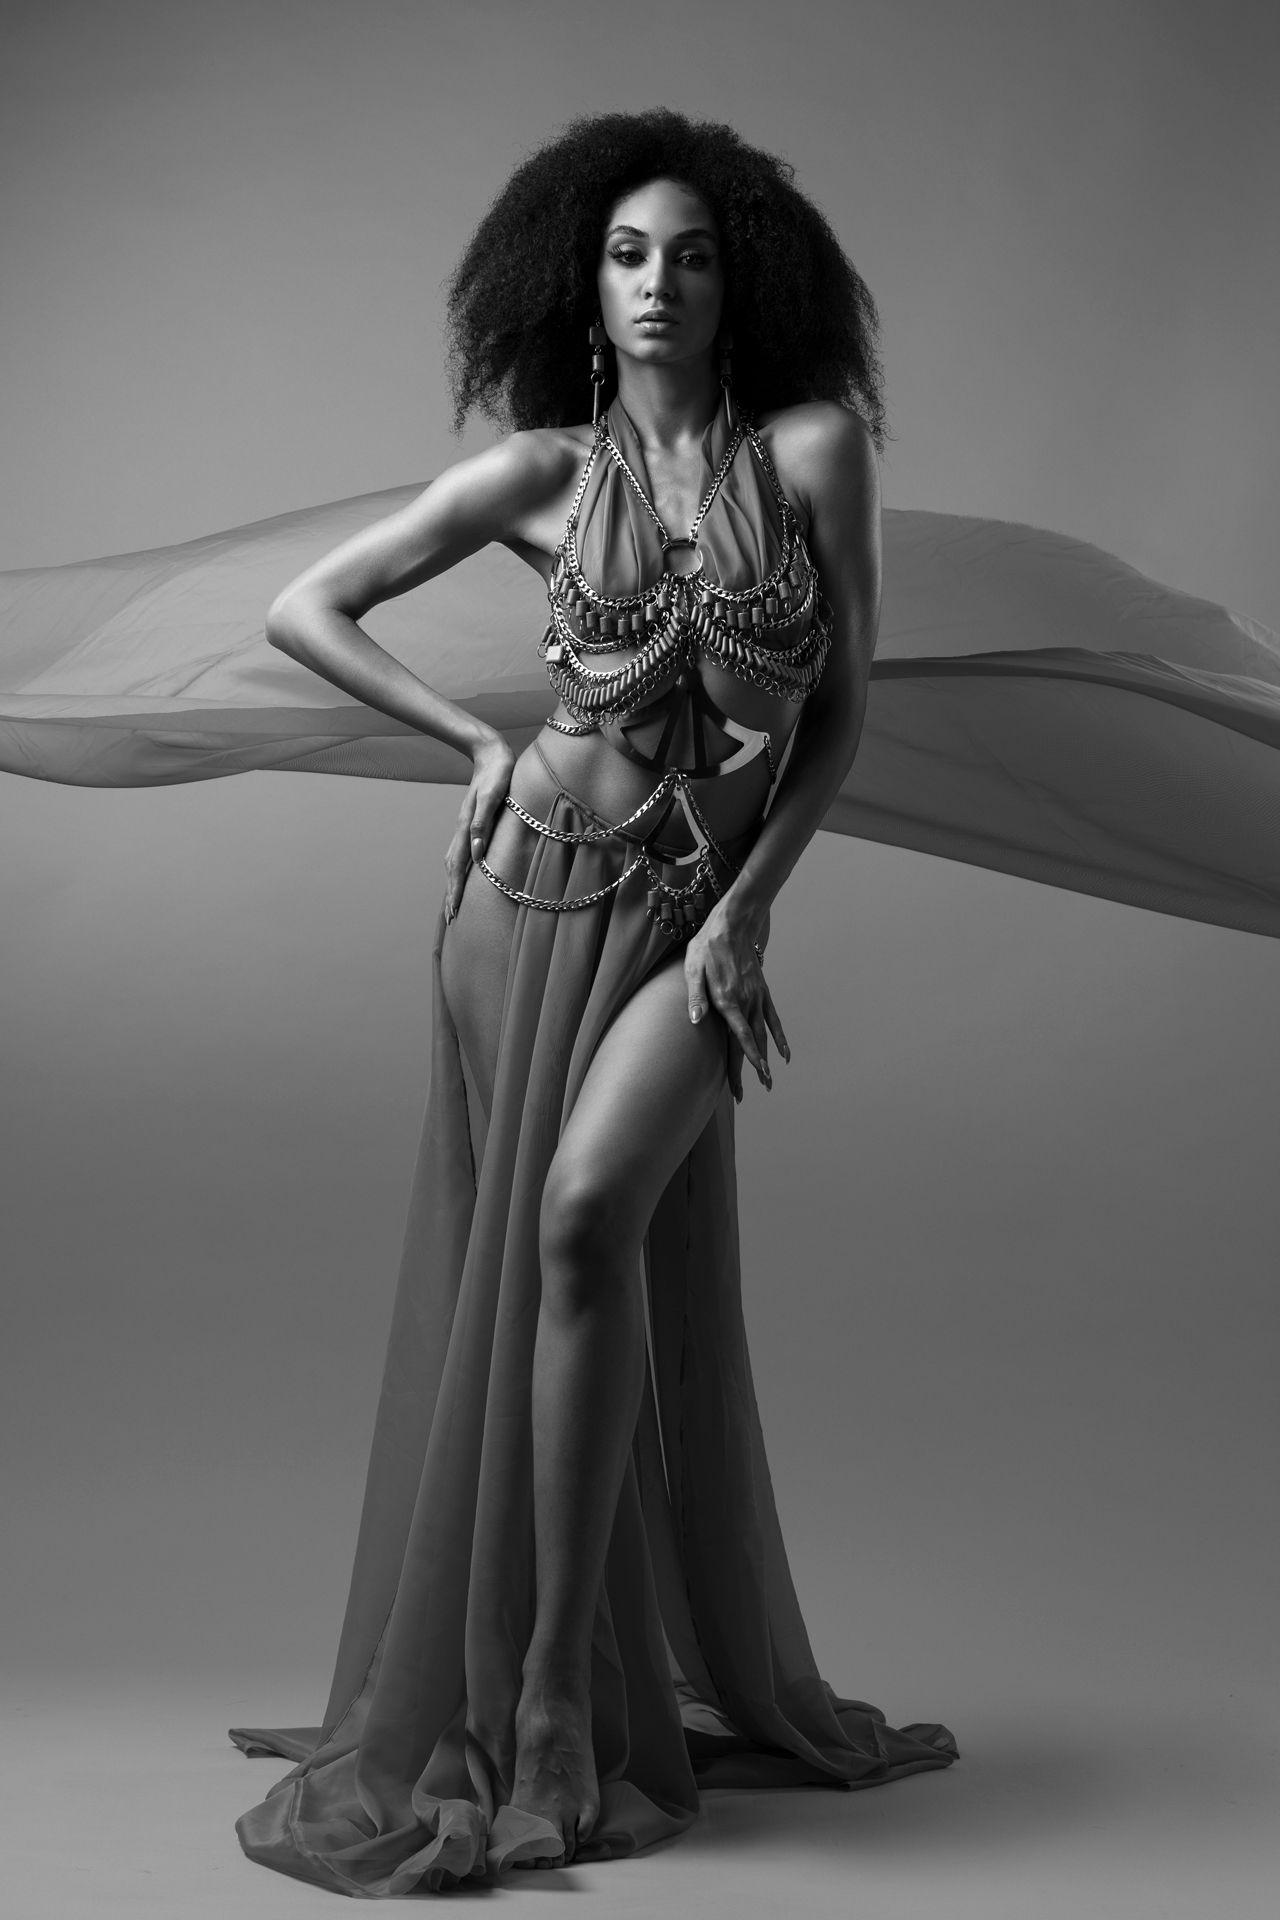 black and white, fashion, portrait, model, modeling, glance, Romanov Yury